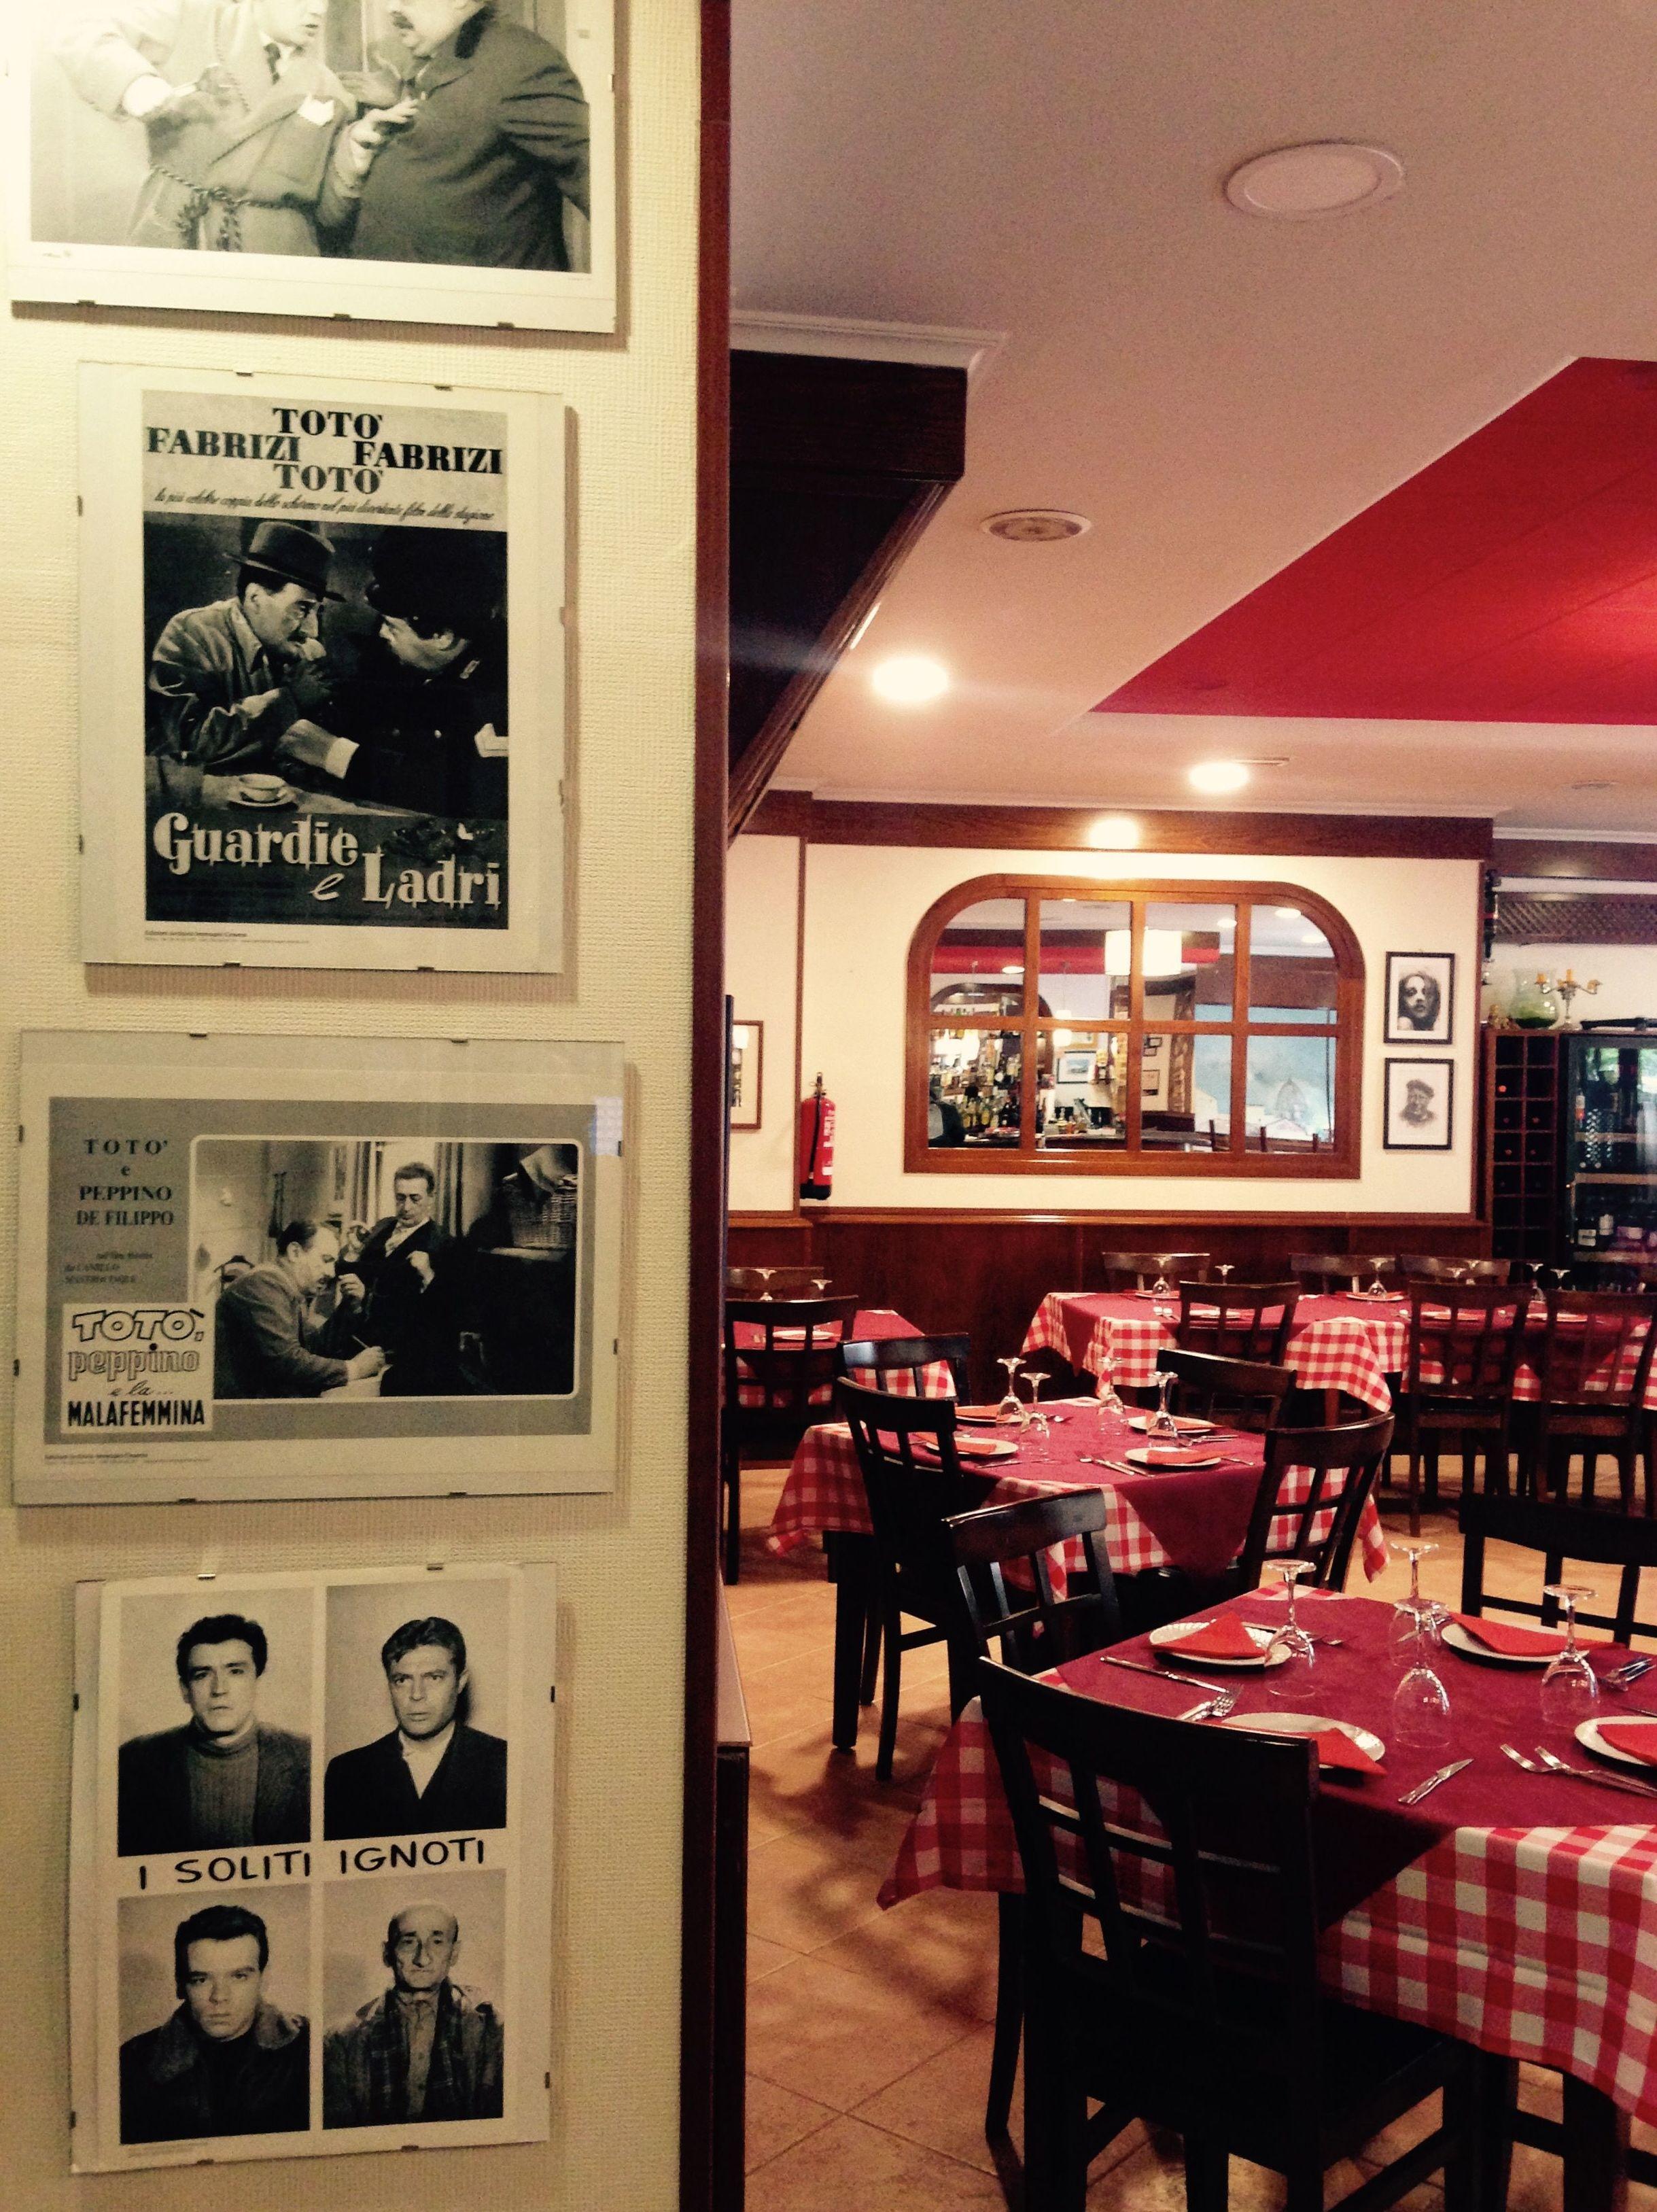 Foto 9 de Restaurante italiano en Aldaia | RESTAURANTE PIZZERIA L'ITALIANO